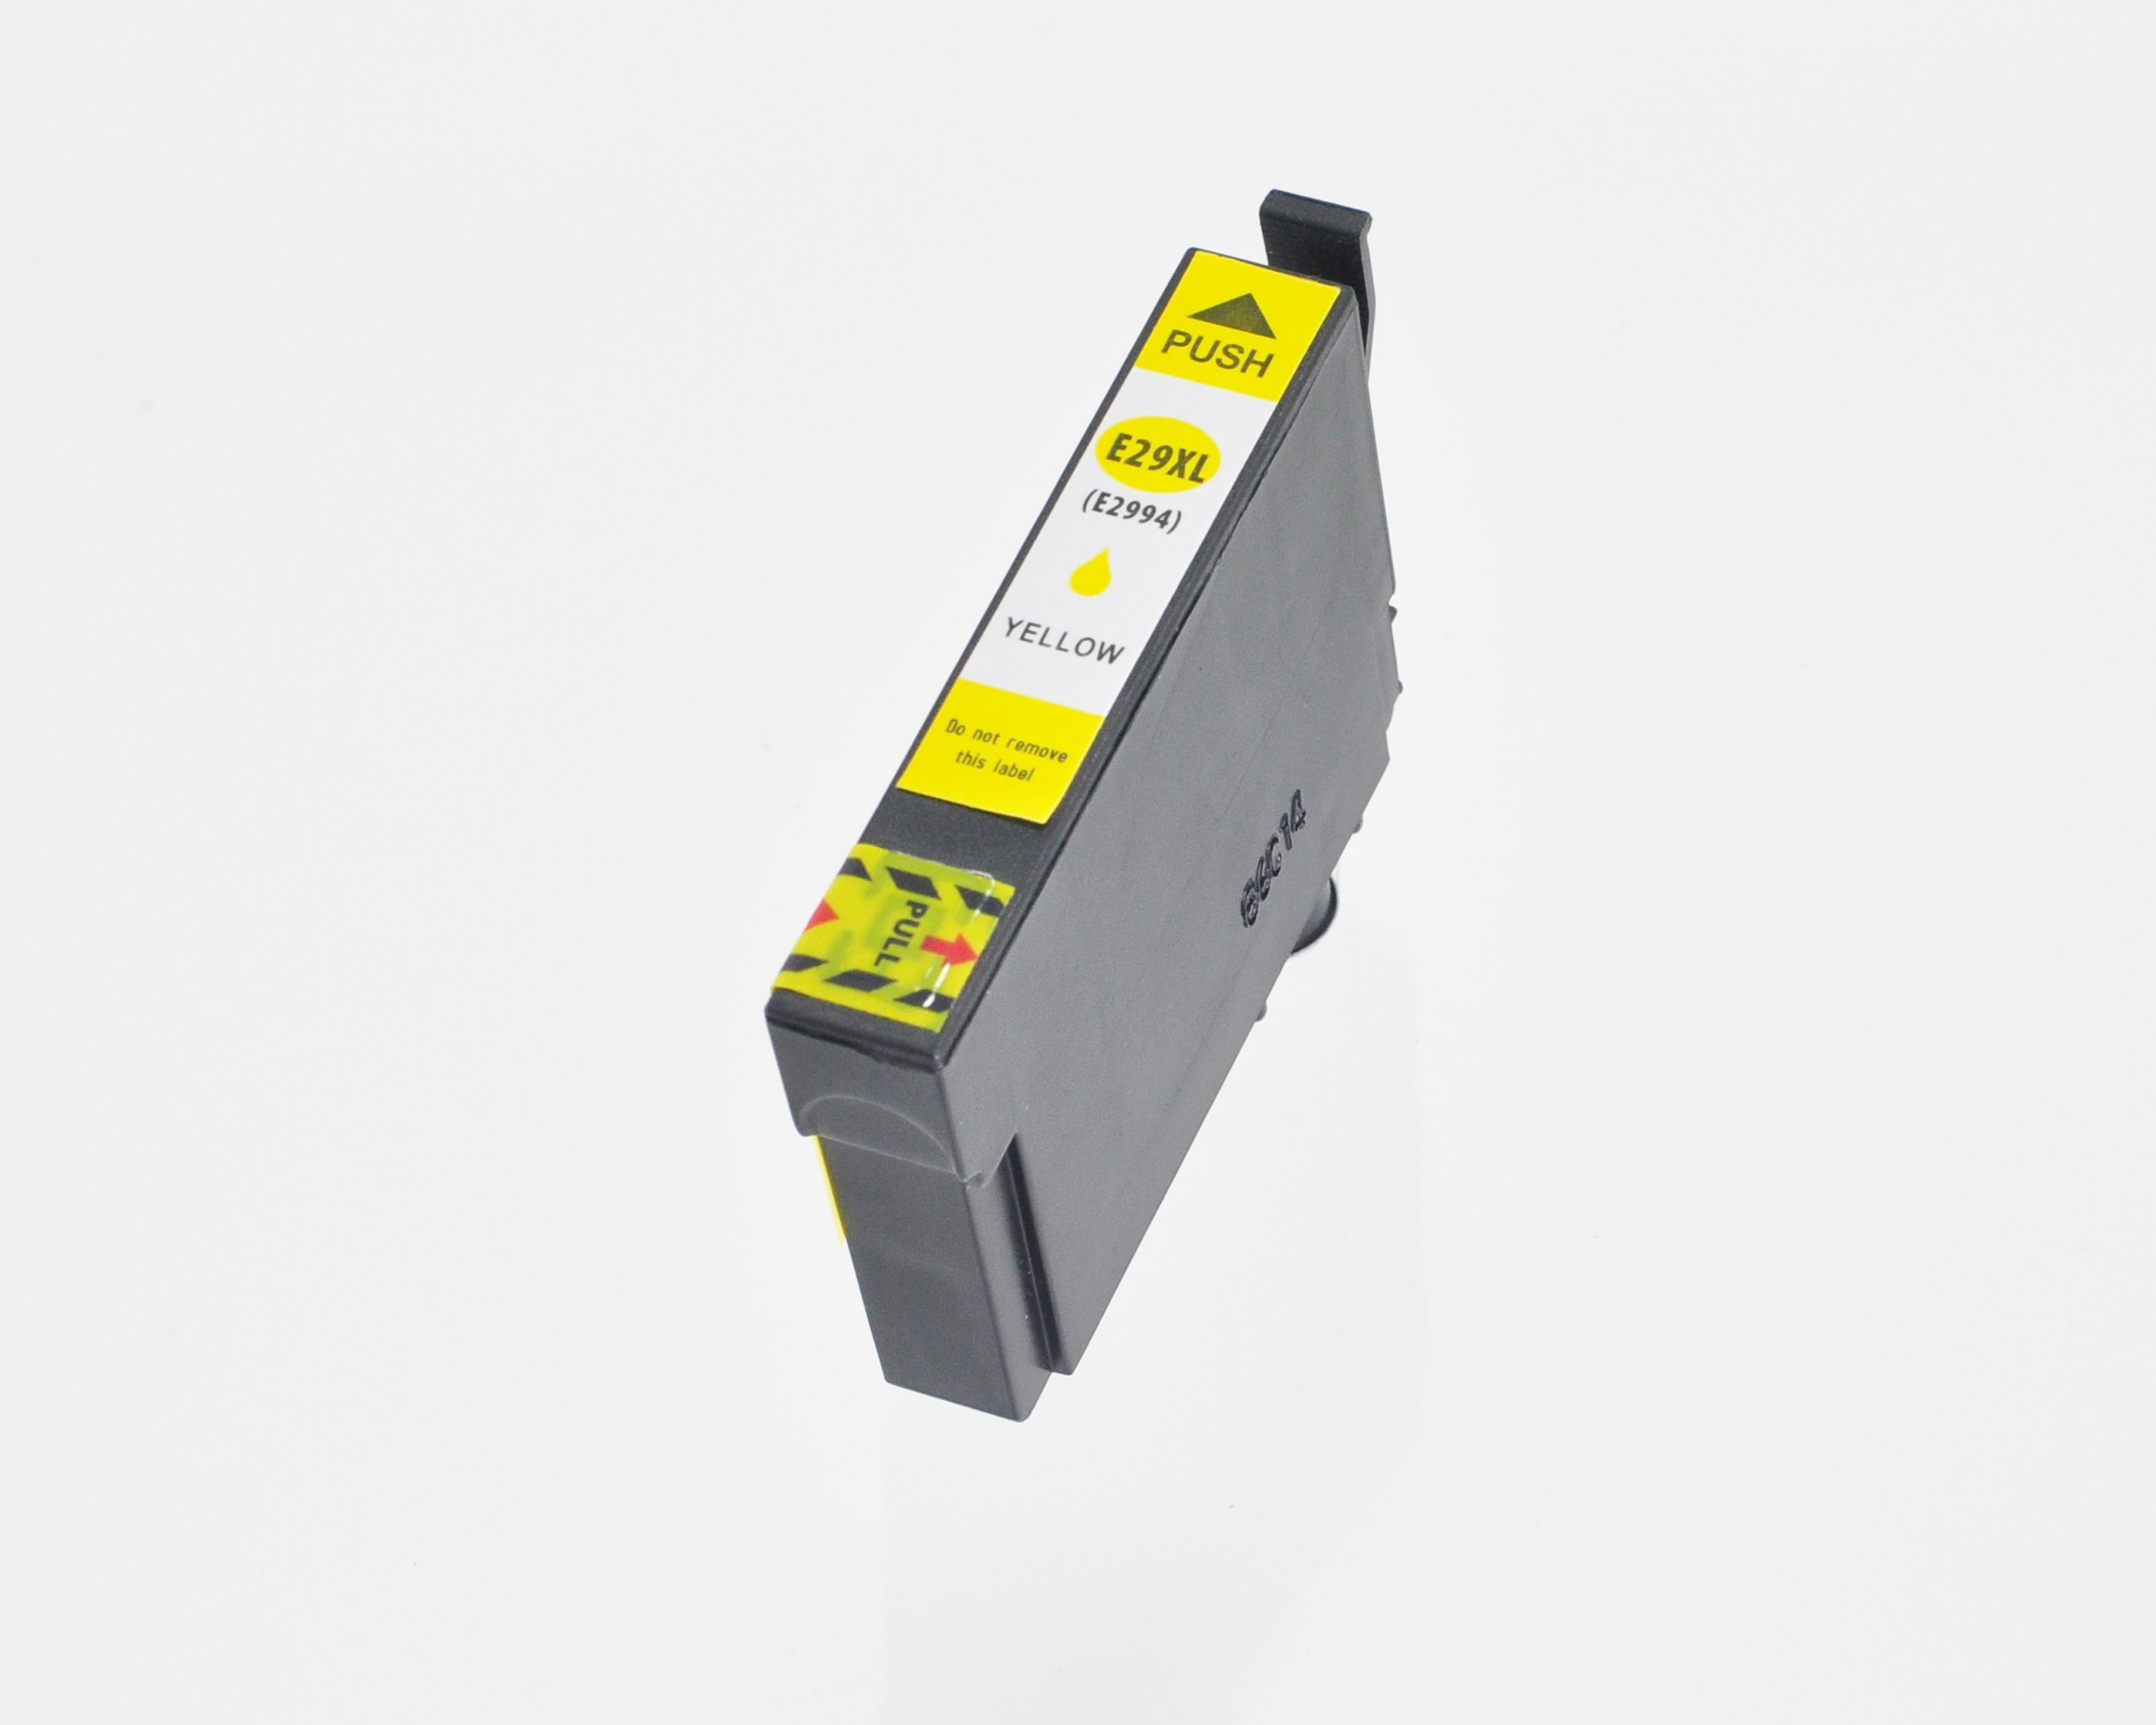 Comp Epson T29944010 Inkjet